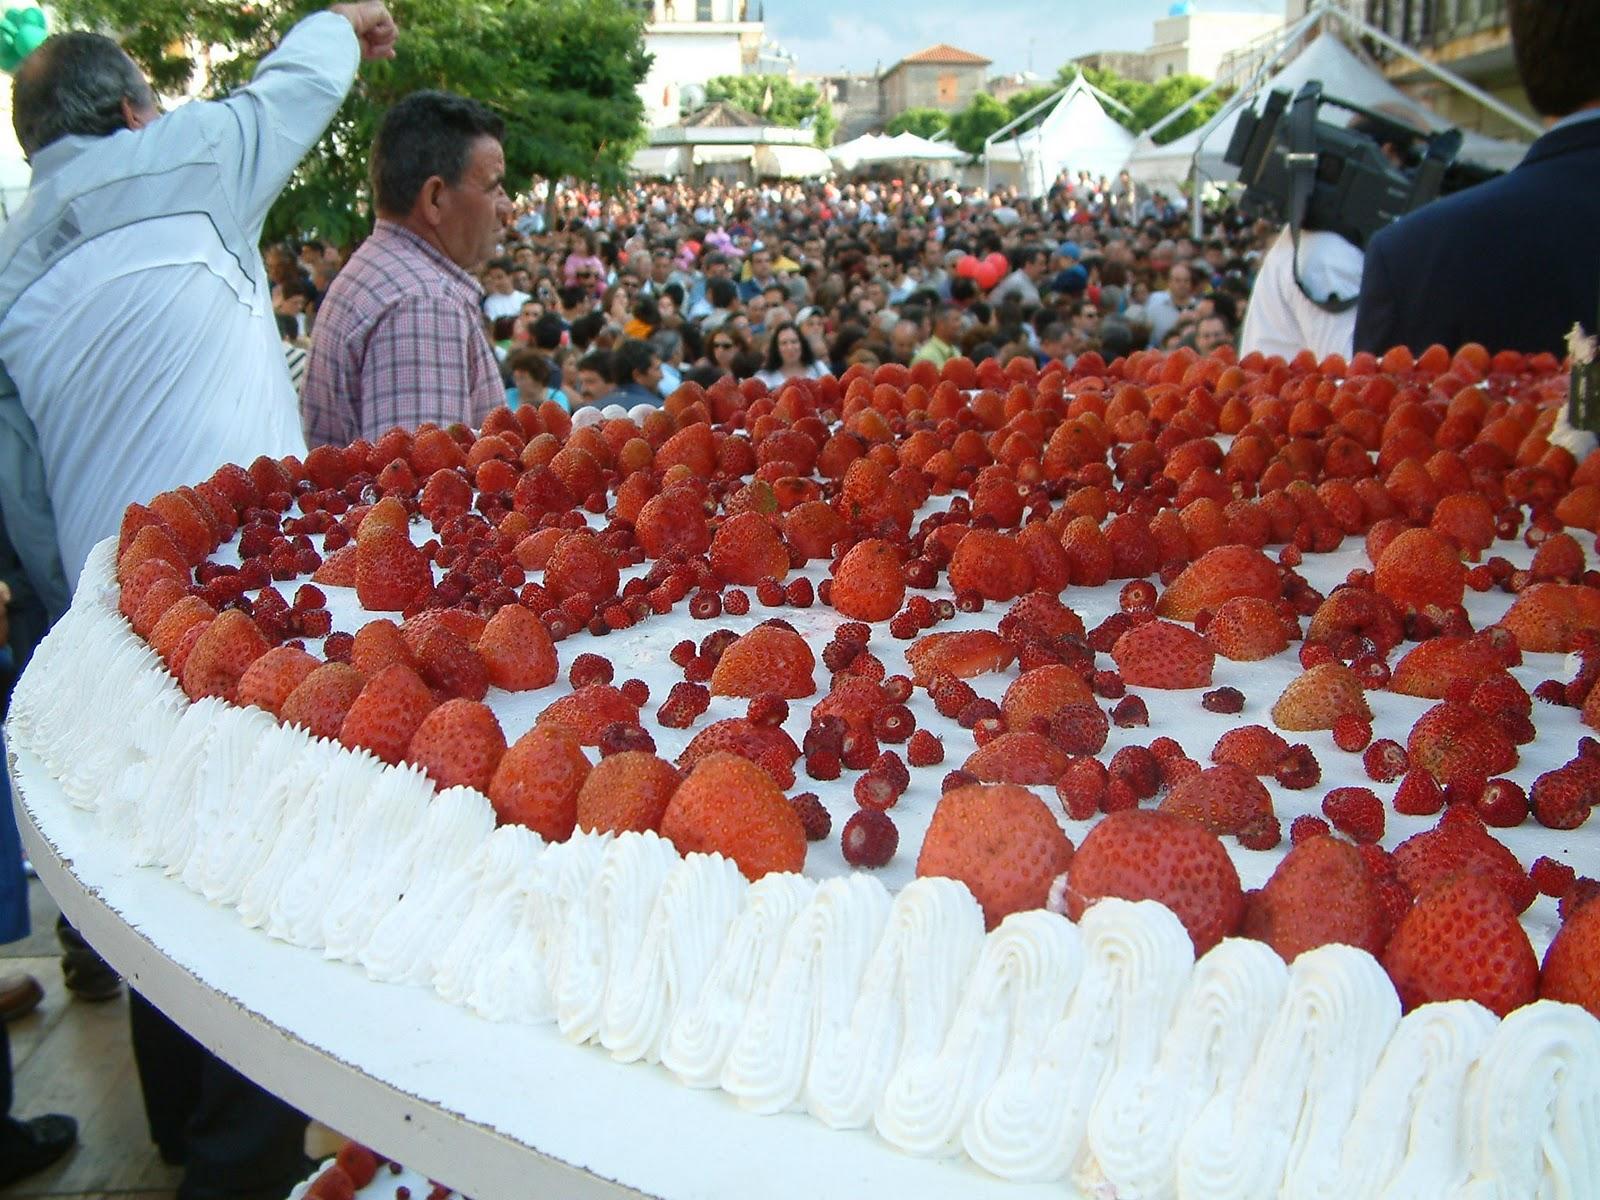 Biggest Cake Images : November 2010 - Italian Style in KuwaitItalian Style in Kuwait